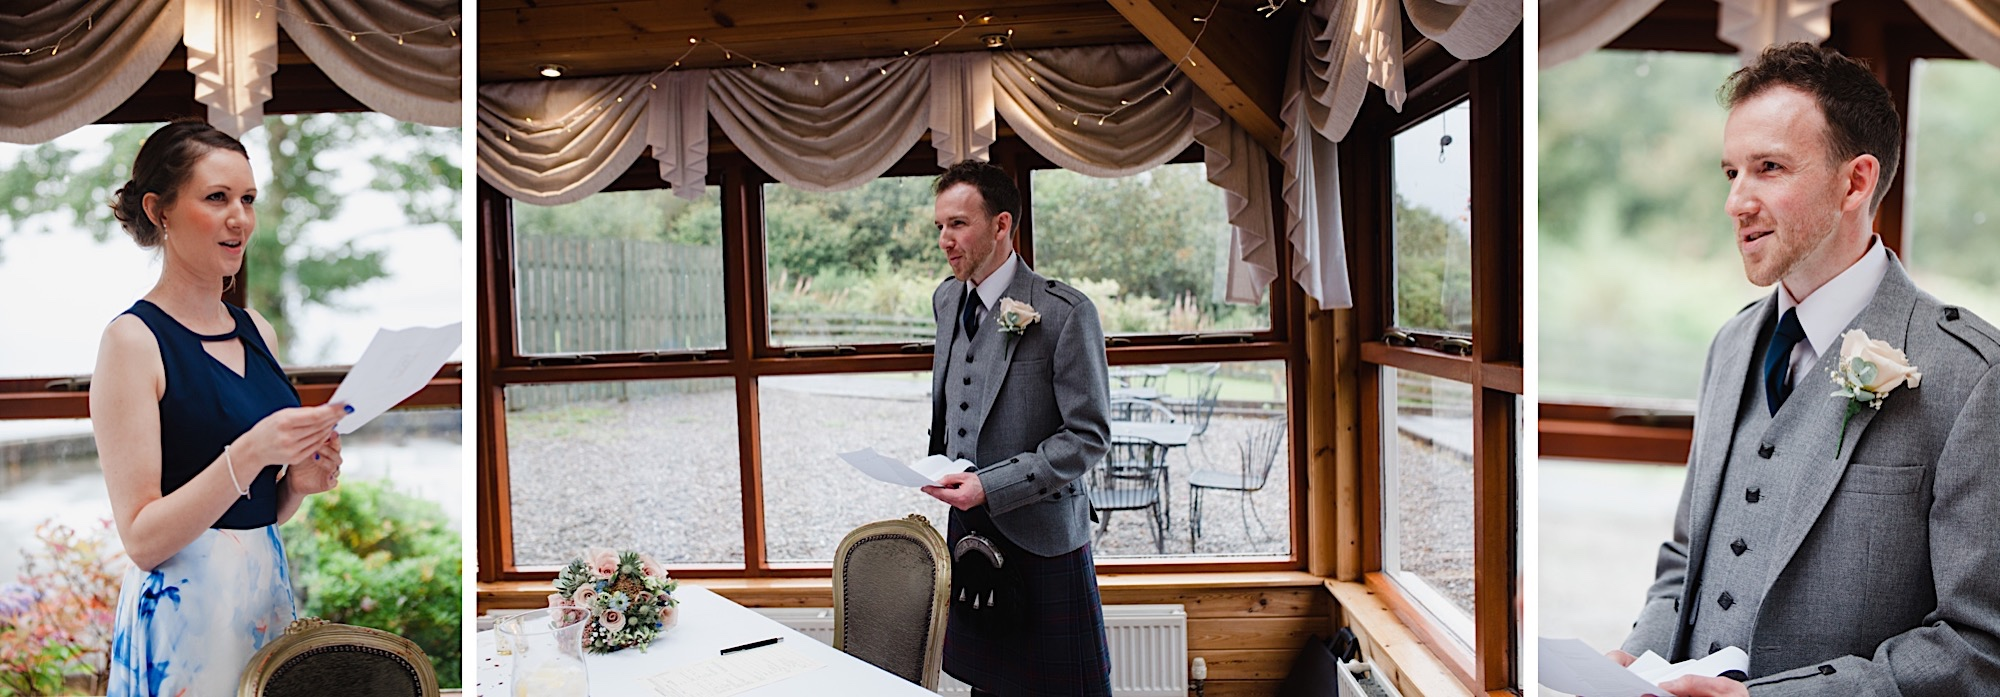 scottish wedding readings